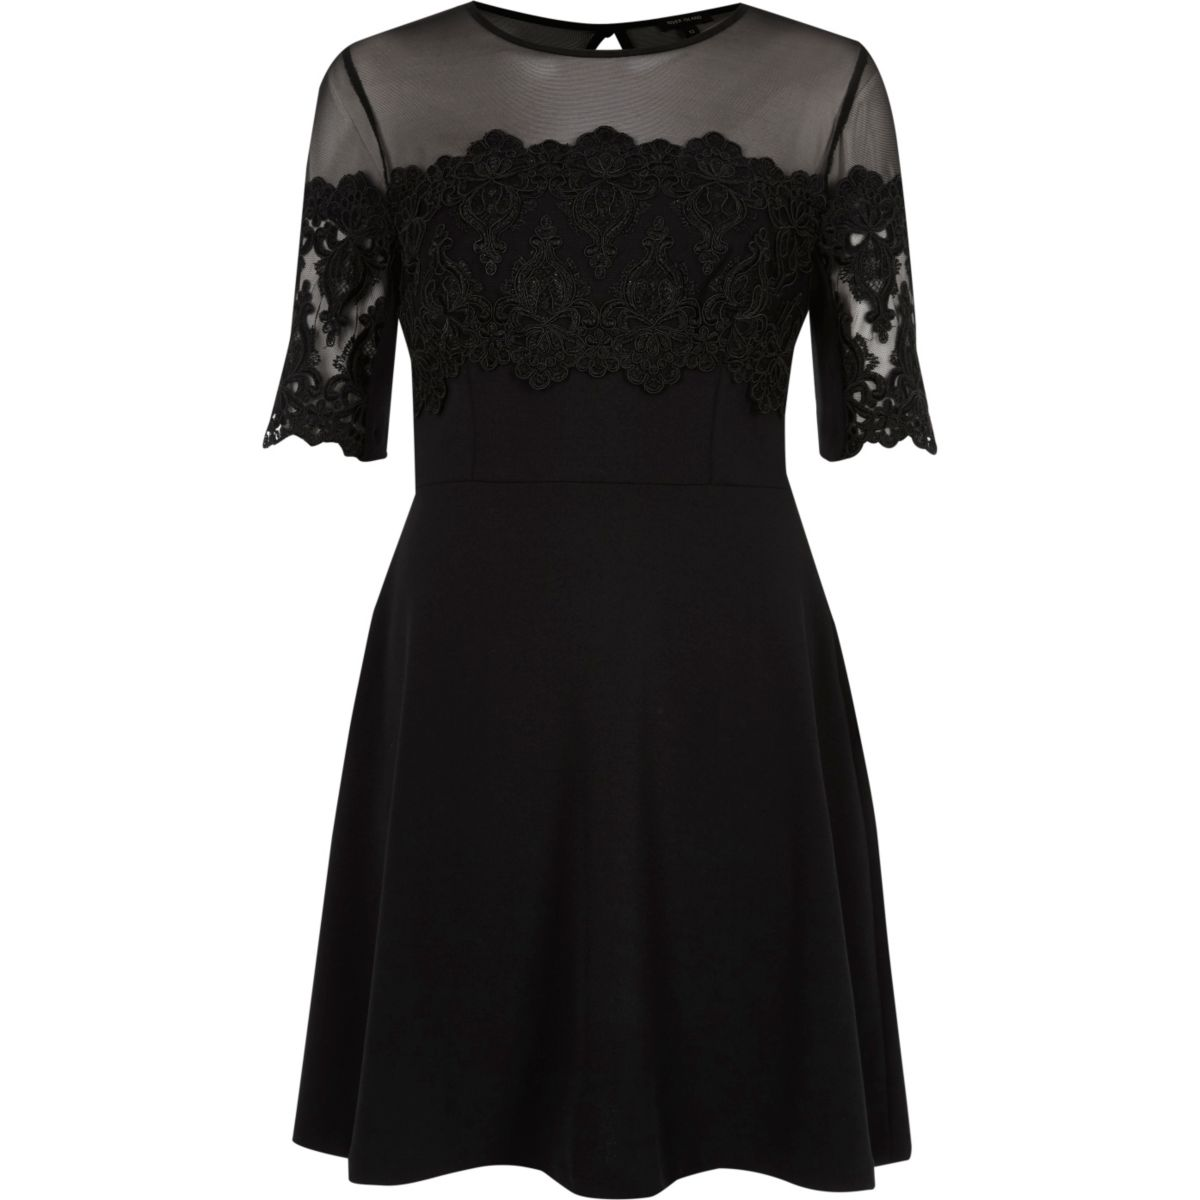 Black mesh and lace panel skater dress